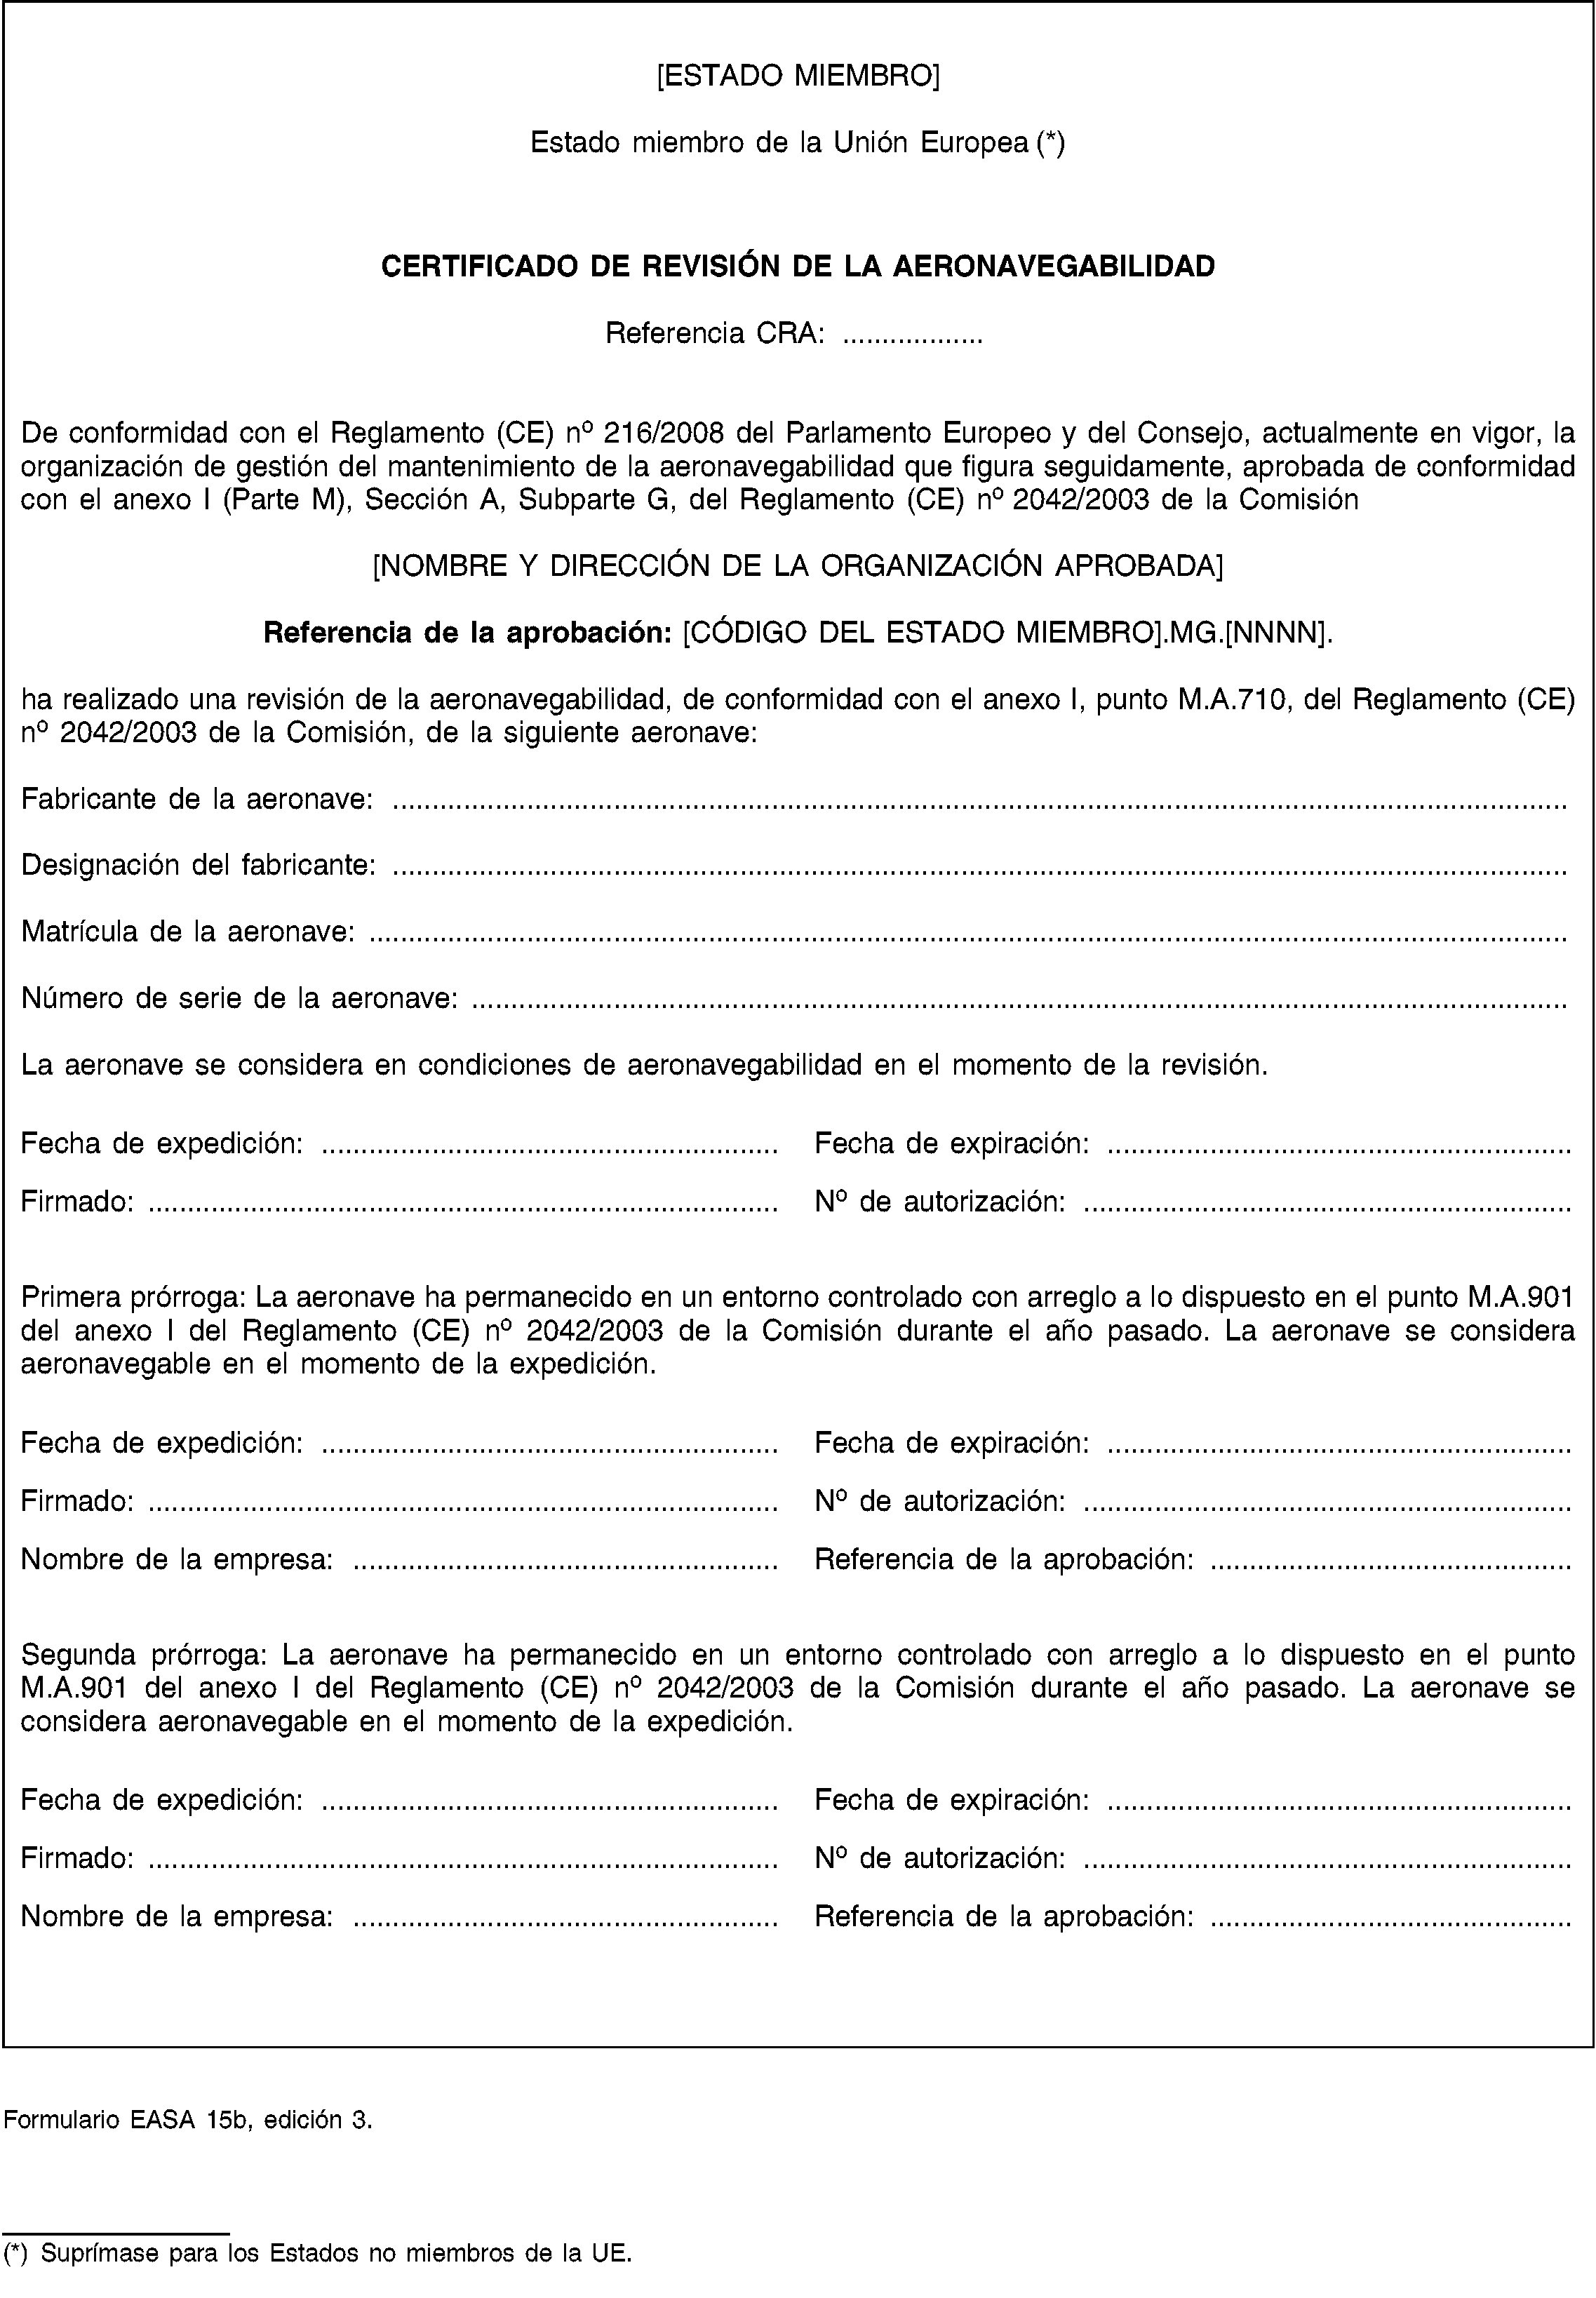 EUR-Lex - 02003R2042-20100305 - EN - EUR-Lex